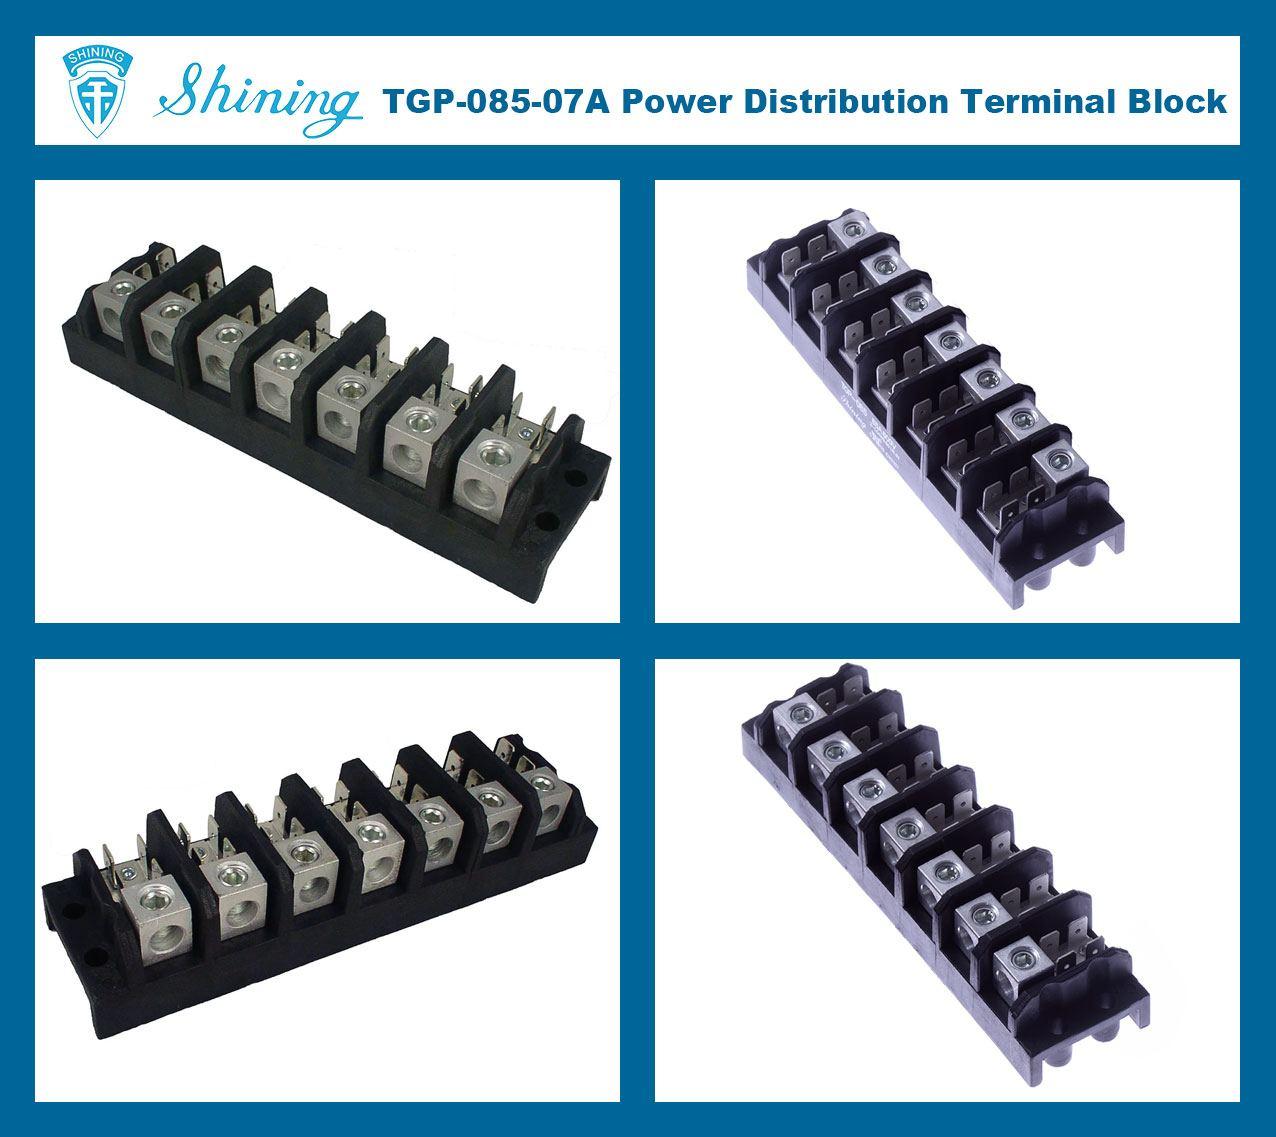 SHINING-TGP-085-07A 600V 85A 7 Pole Electrical Power Terminal Block